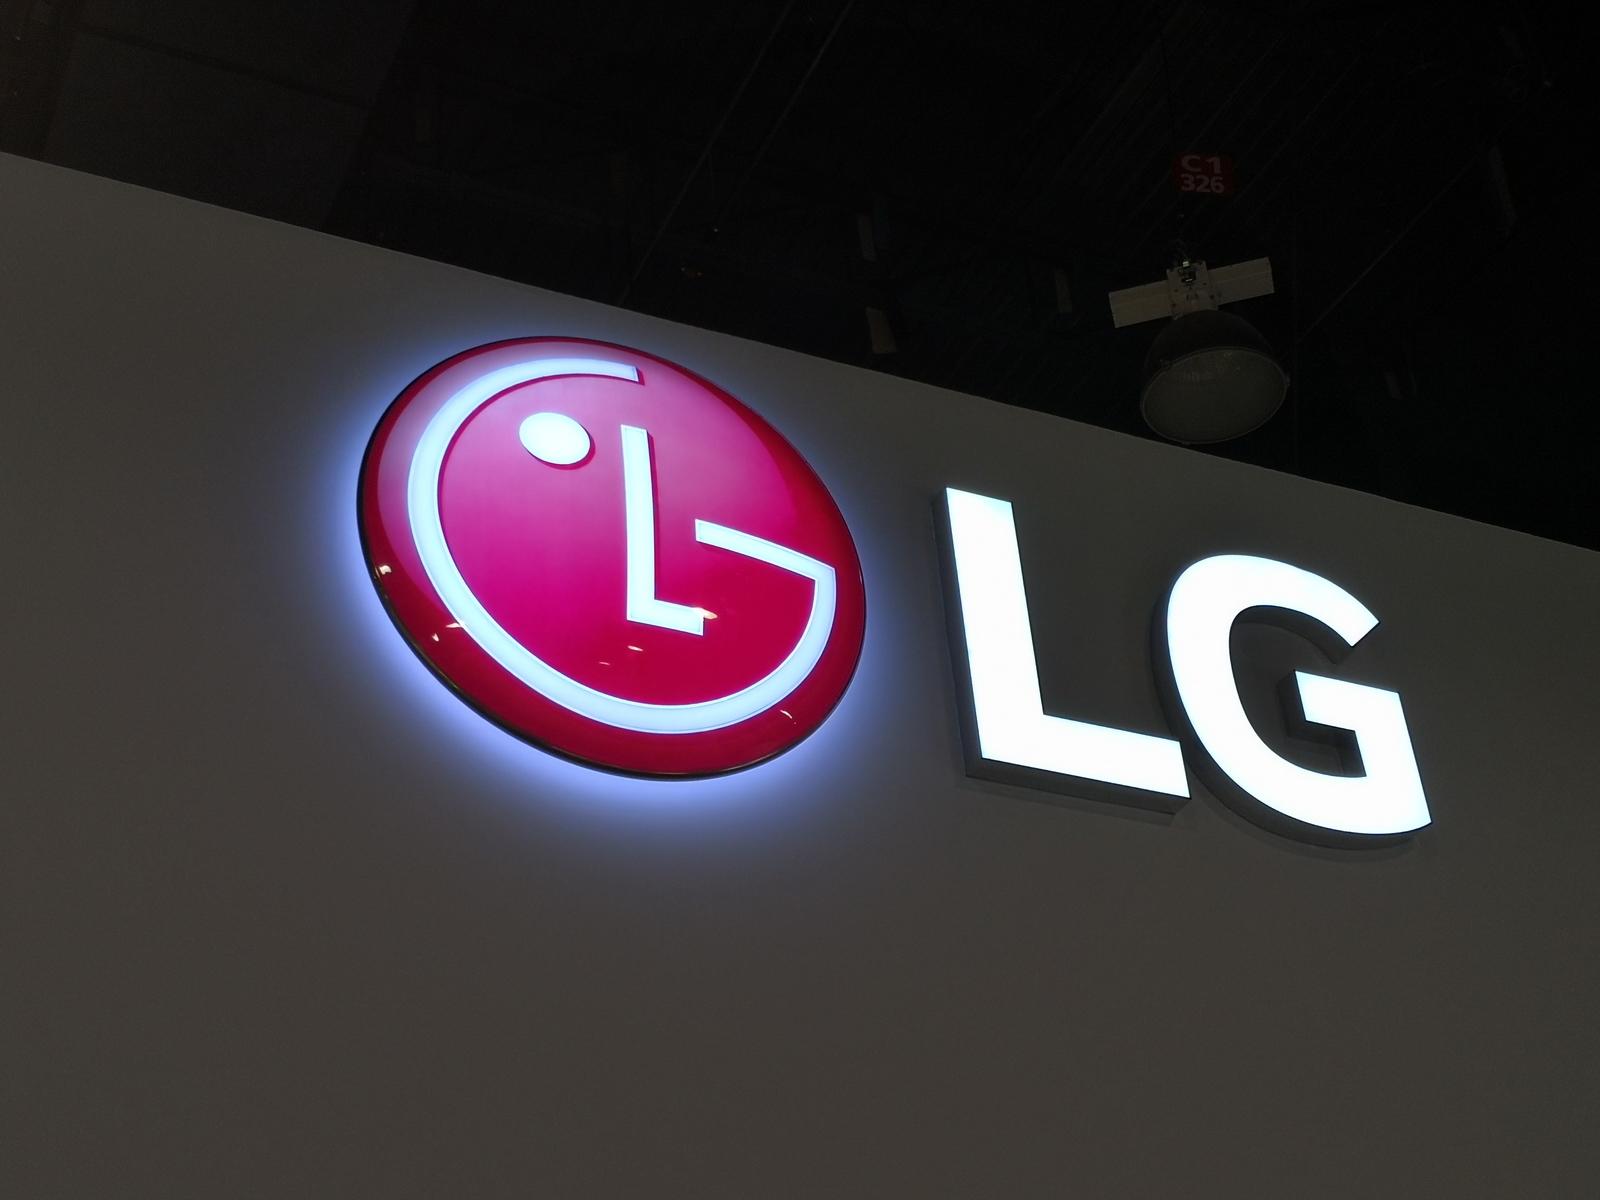 LG折叠屏设计专利曝光 与华为Mate X极为相似